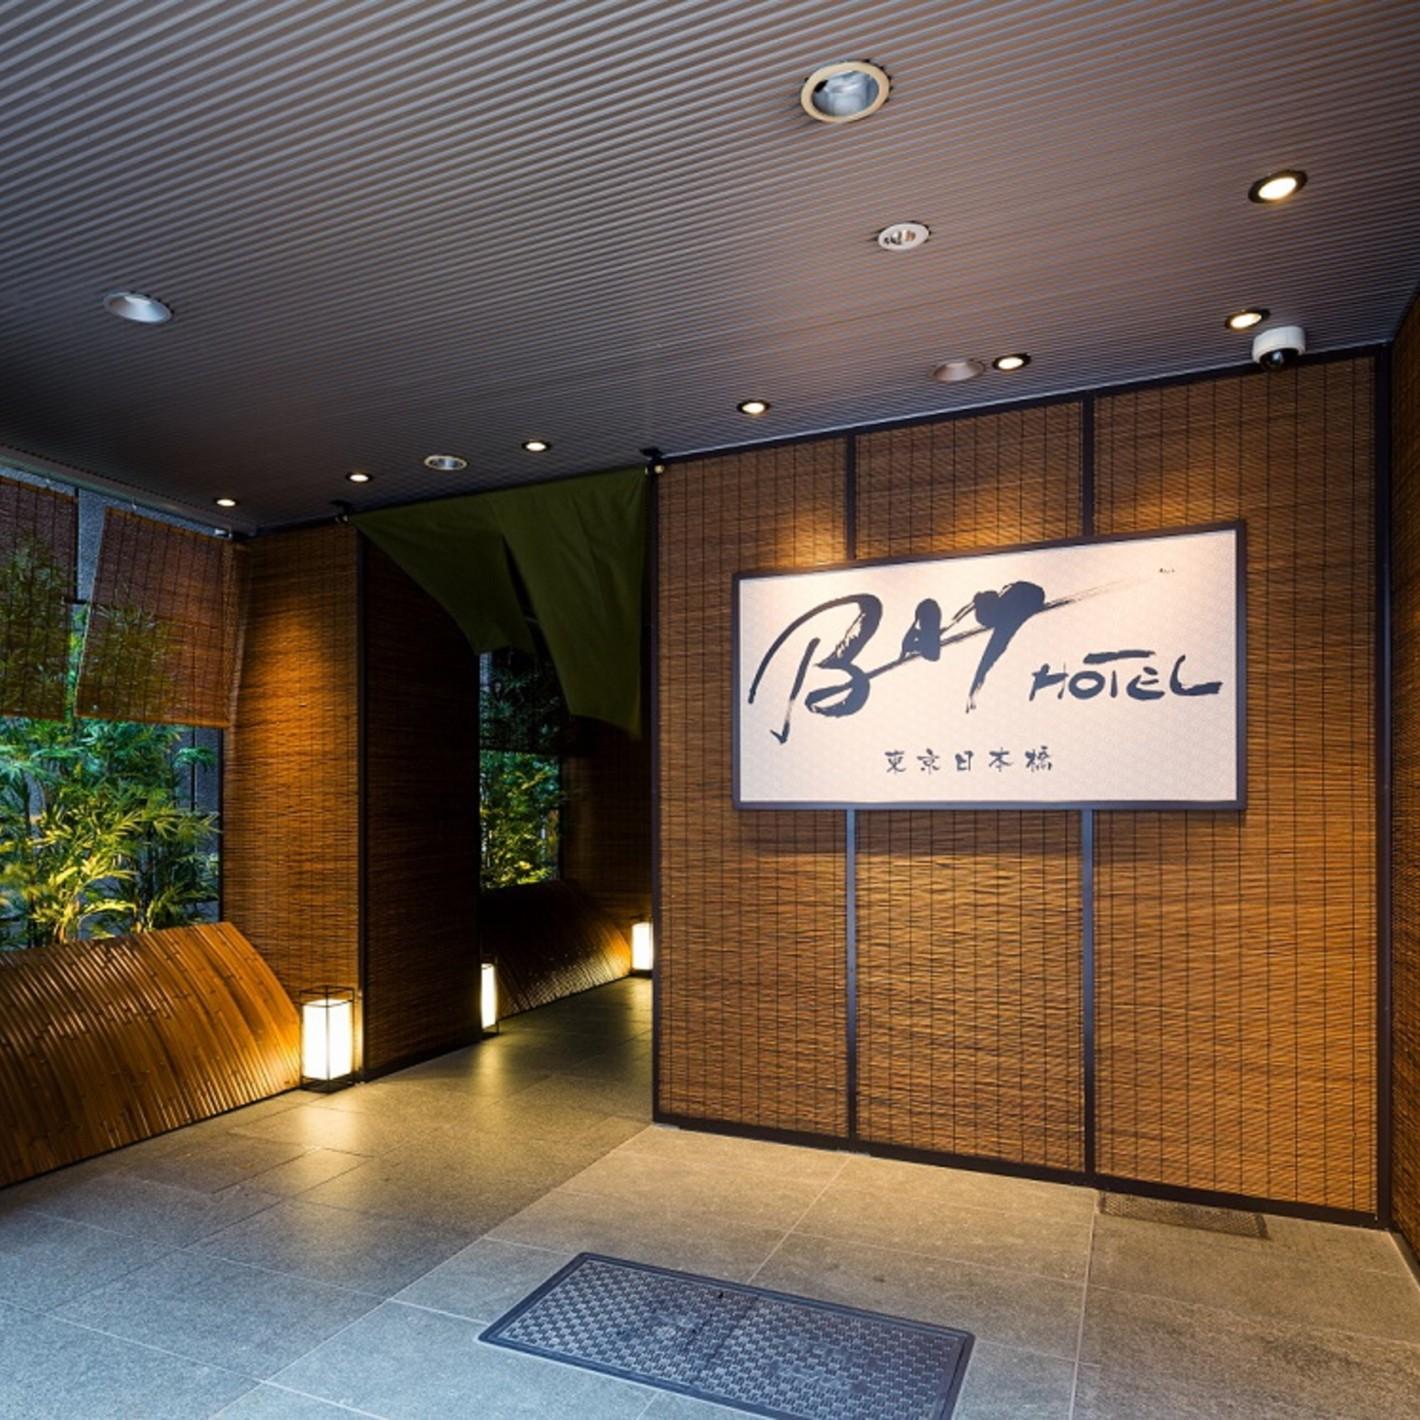 東京駅前BAY HOTEL東京日本橋BAY HOTEL